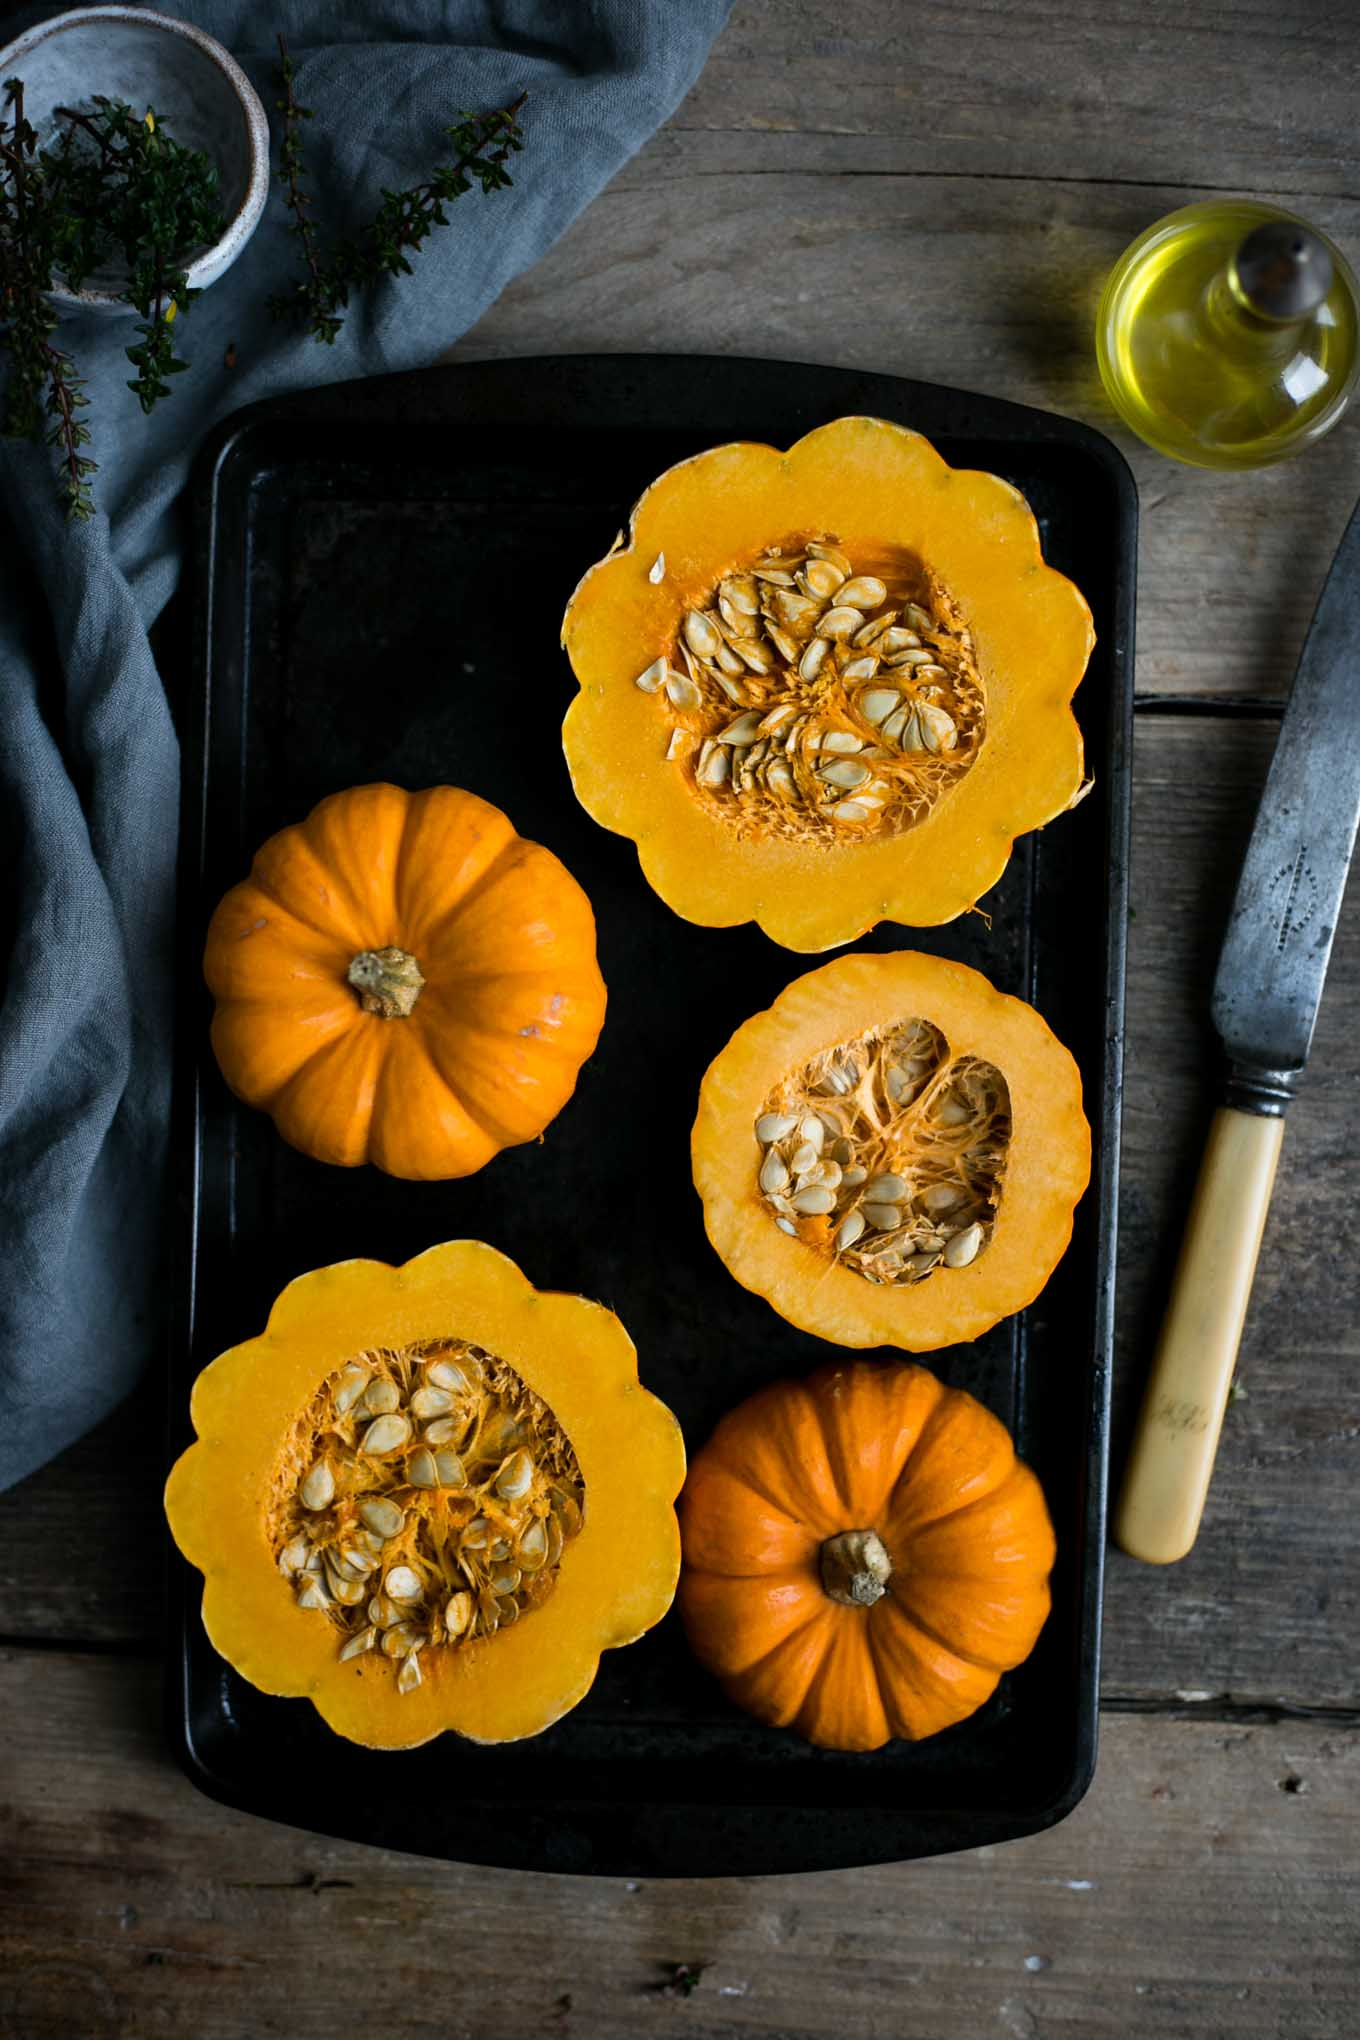 Roasted pumpkin and walnut salad with figs #vegan #pumpkinsalad #vegetarian   via @annabanana.co